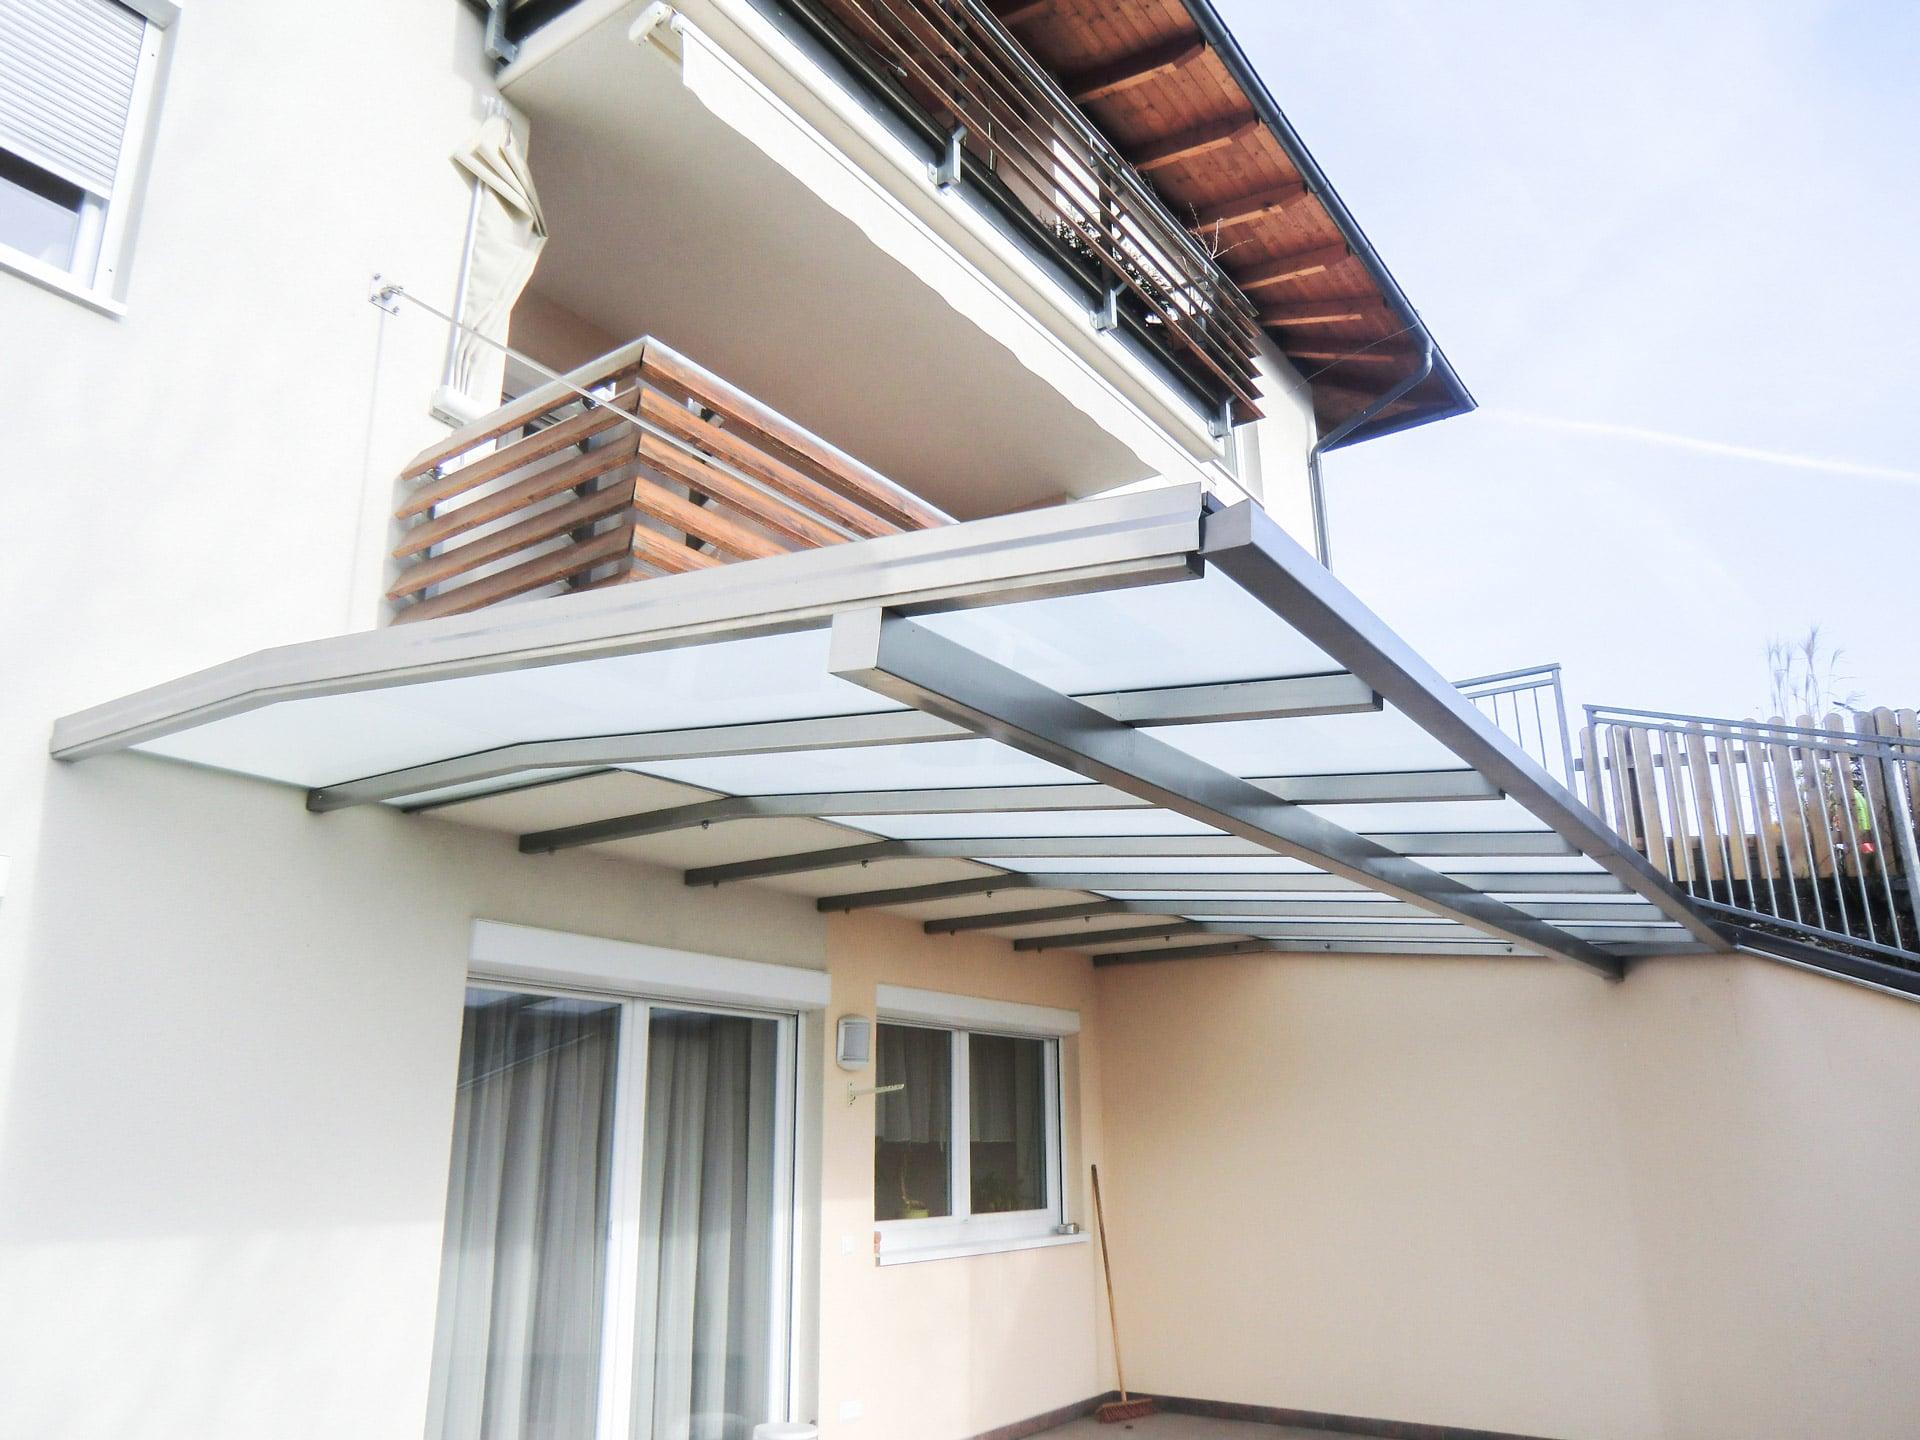 Terrassendach Niro 02 a | ohne Steher an Balkonbodenplatte befestigt, Edelstahl-Mattglas | Svoboda